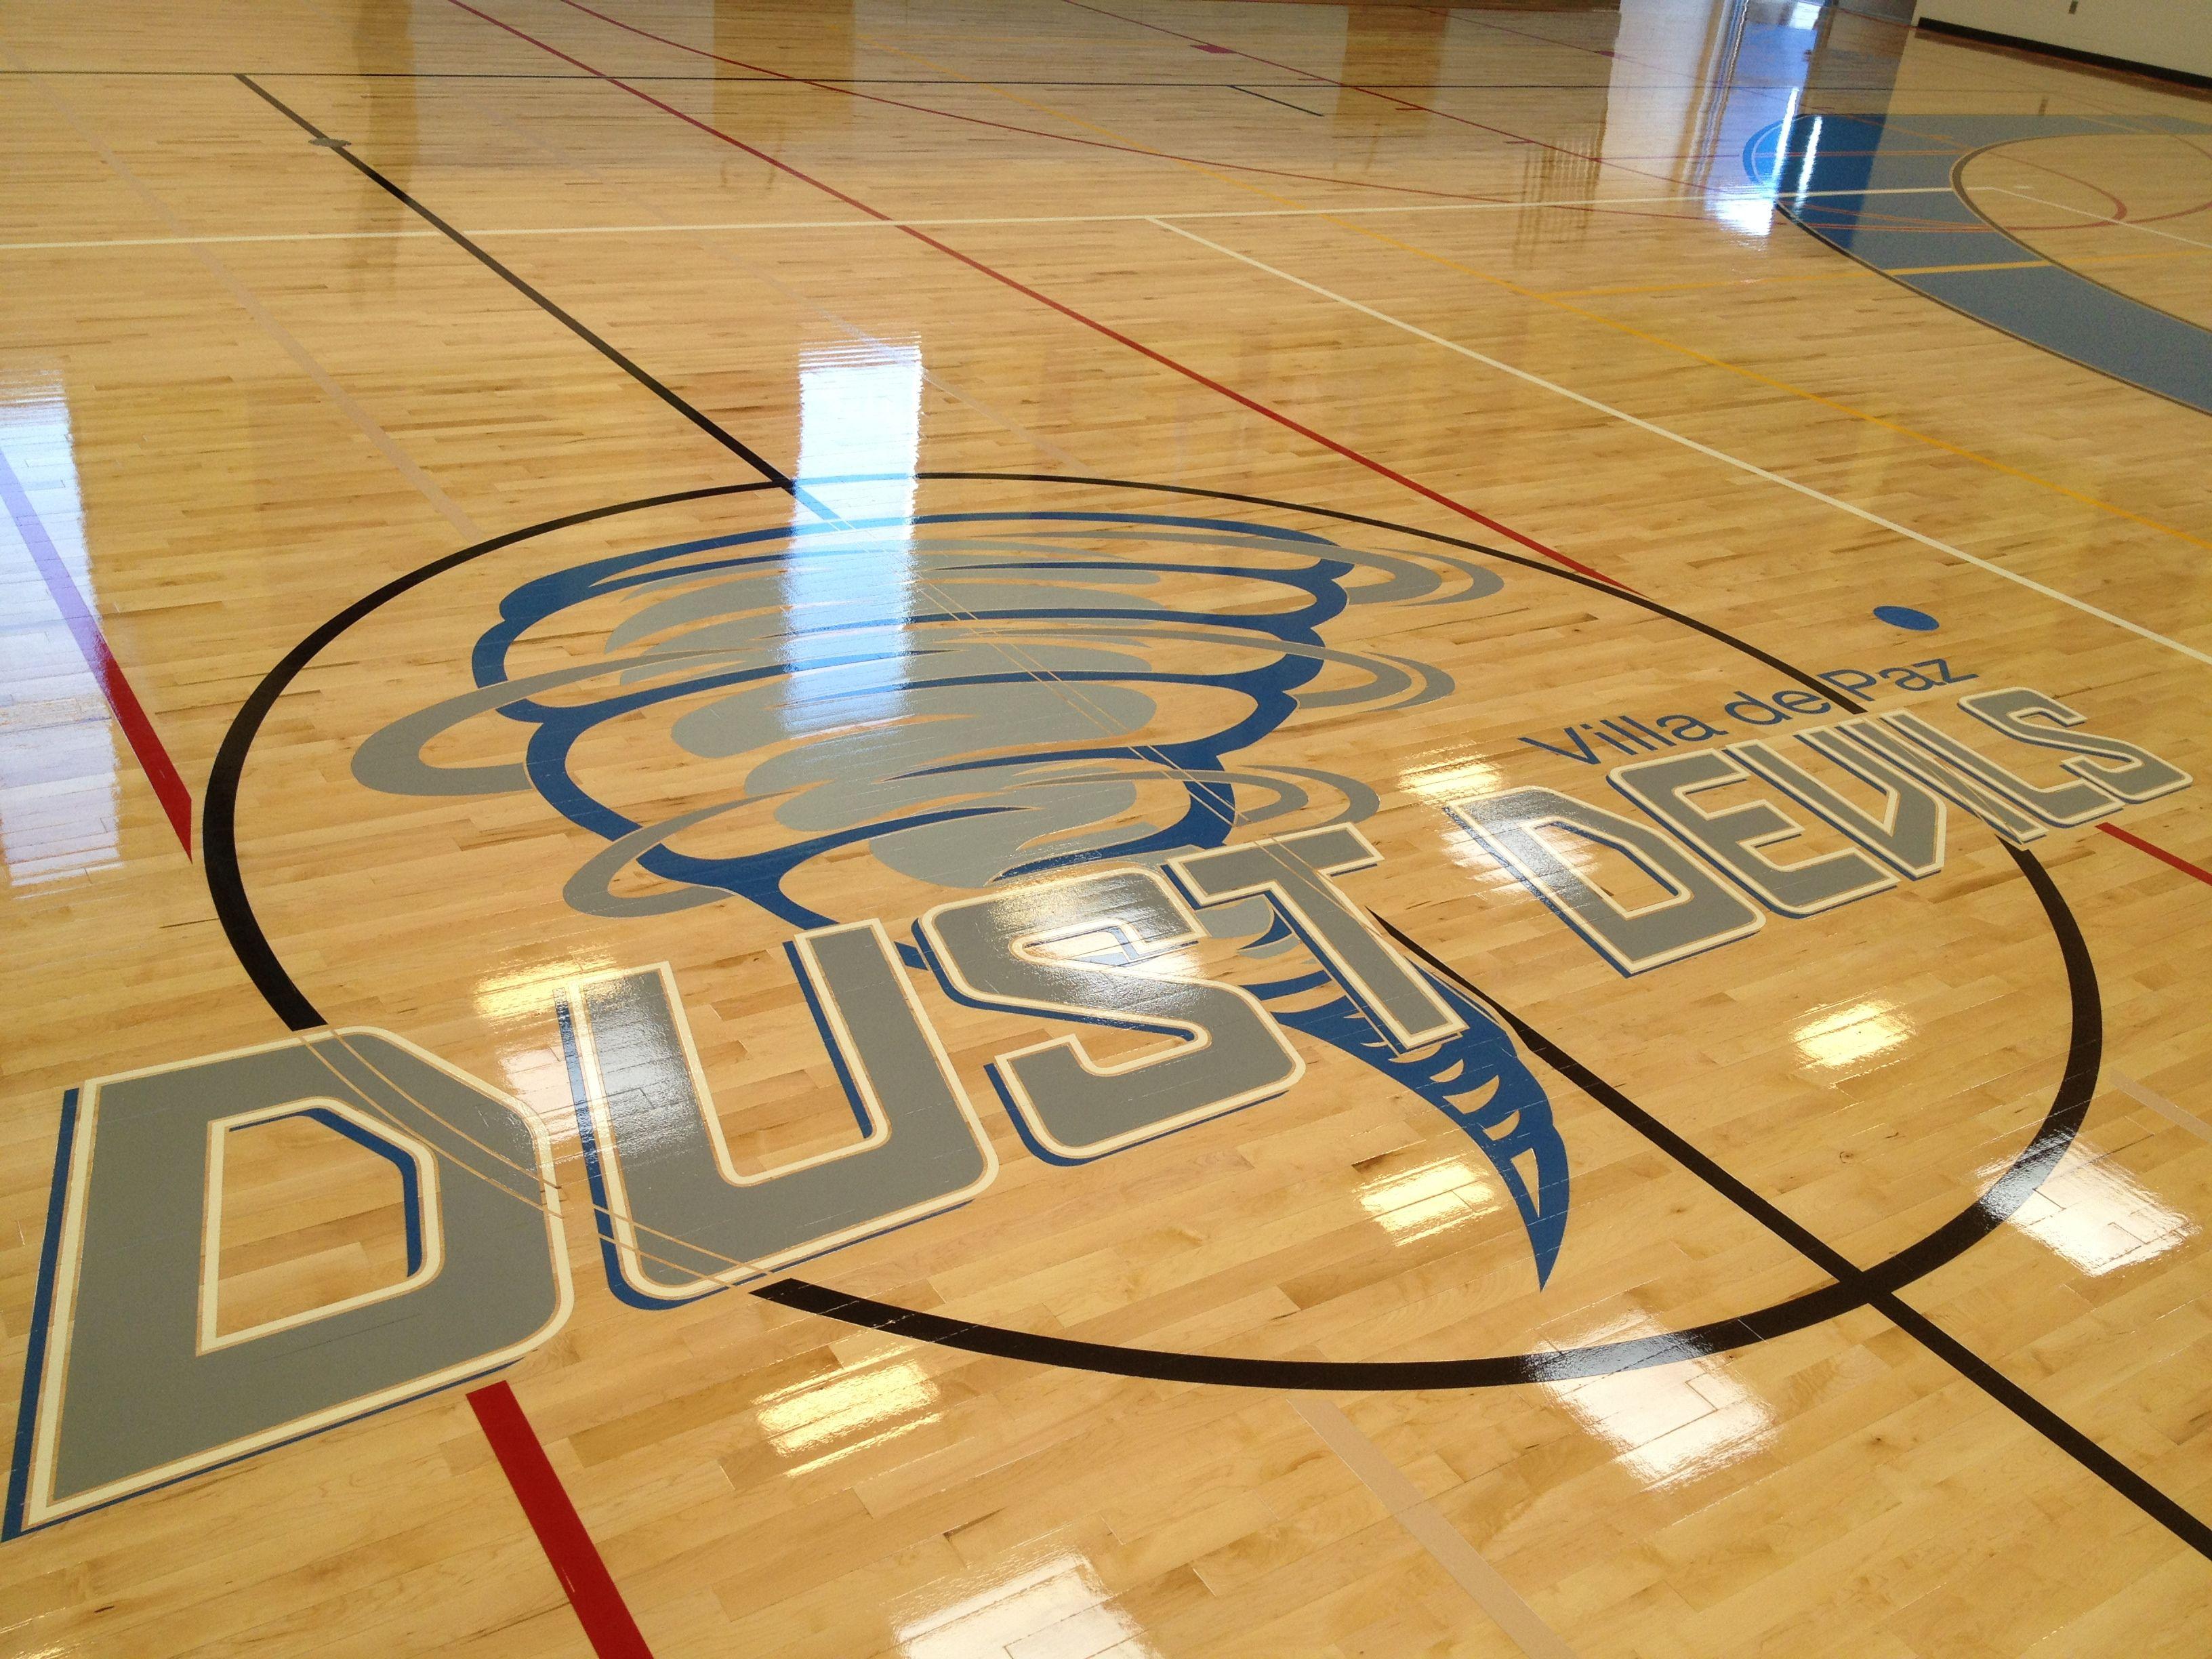 Villa De Paz Elementary School Logo Phoenix Arizona Gym